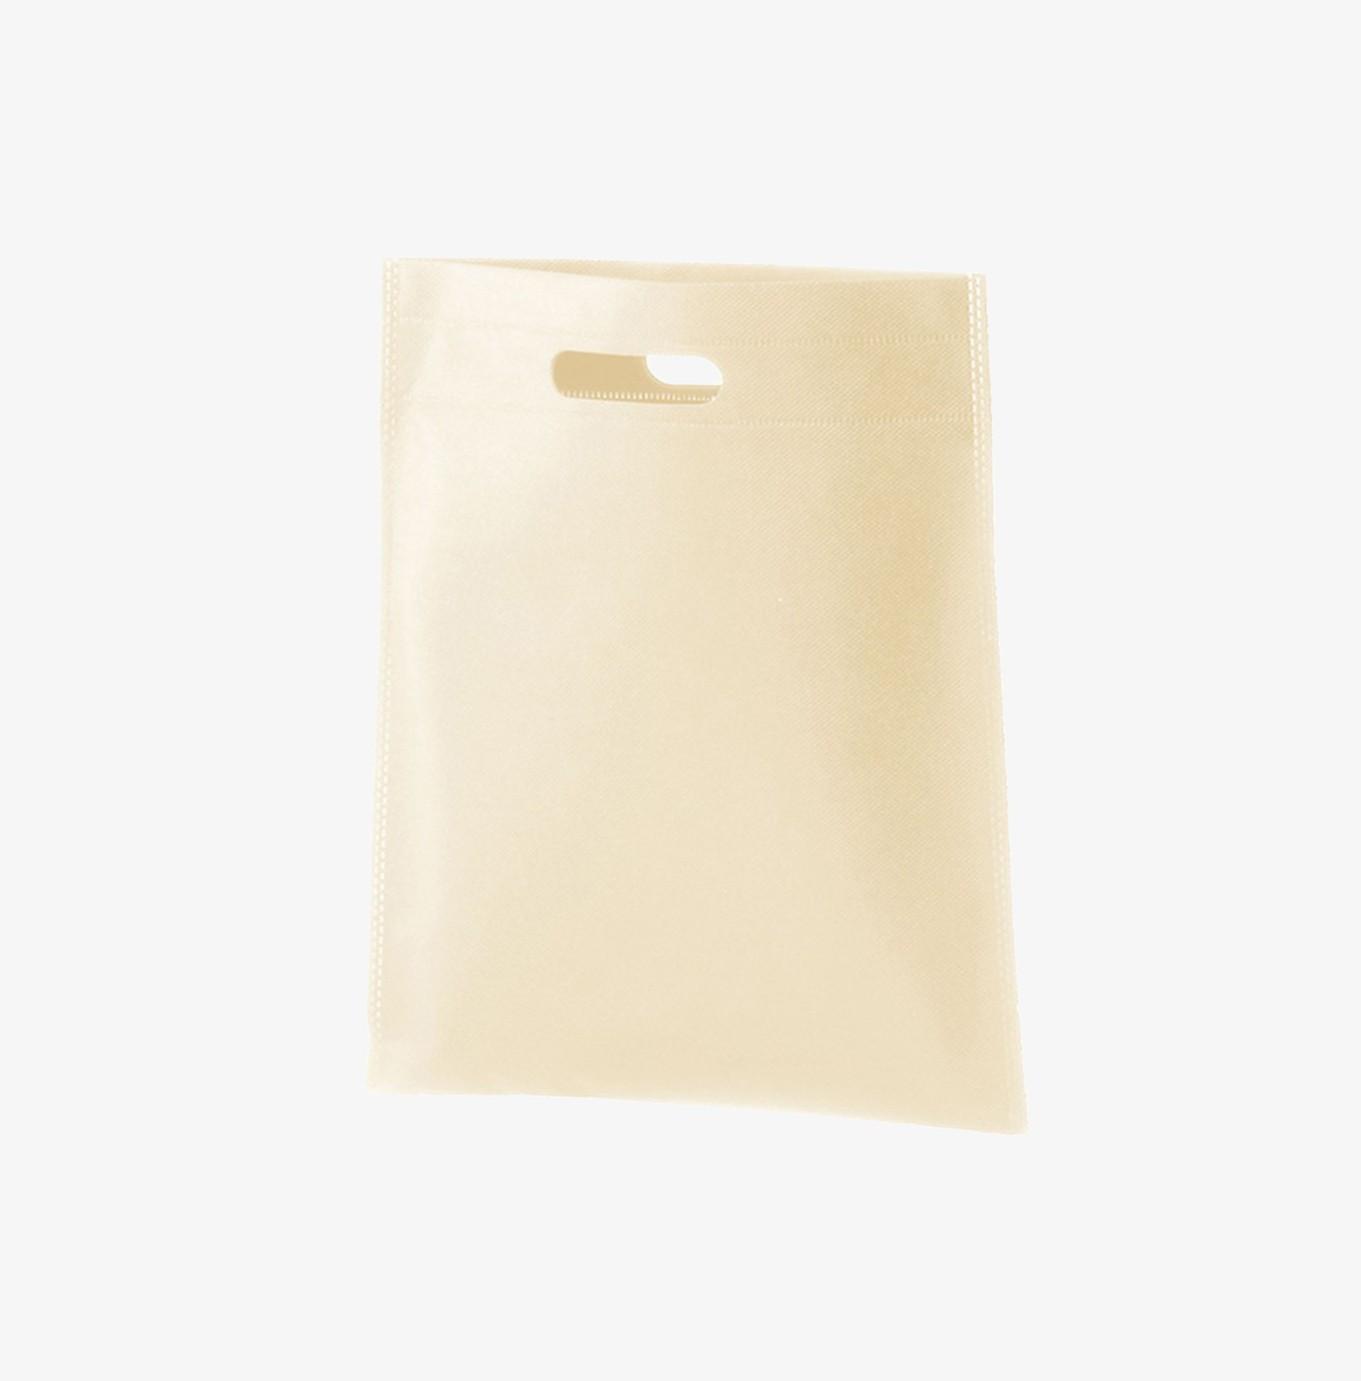 PKD50x60MB 米白色平口袋 50x60cm